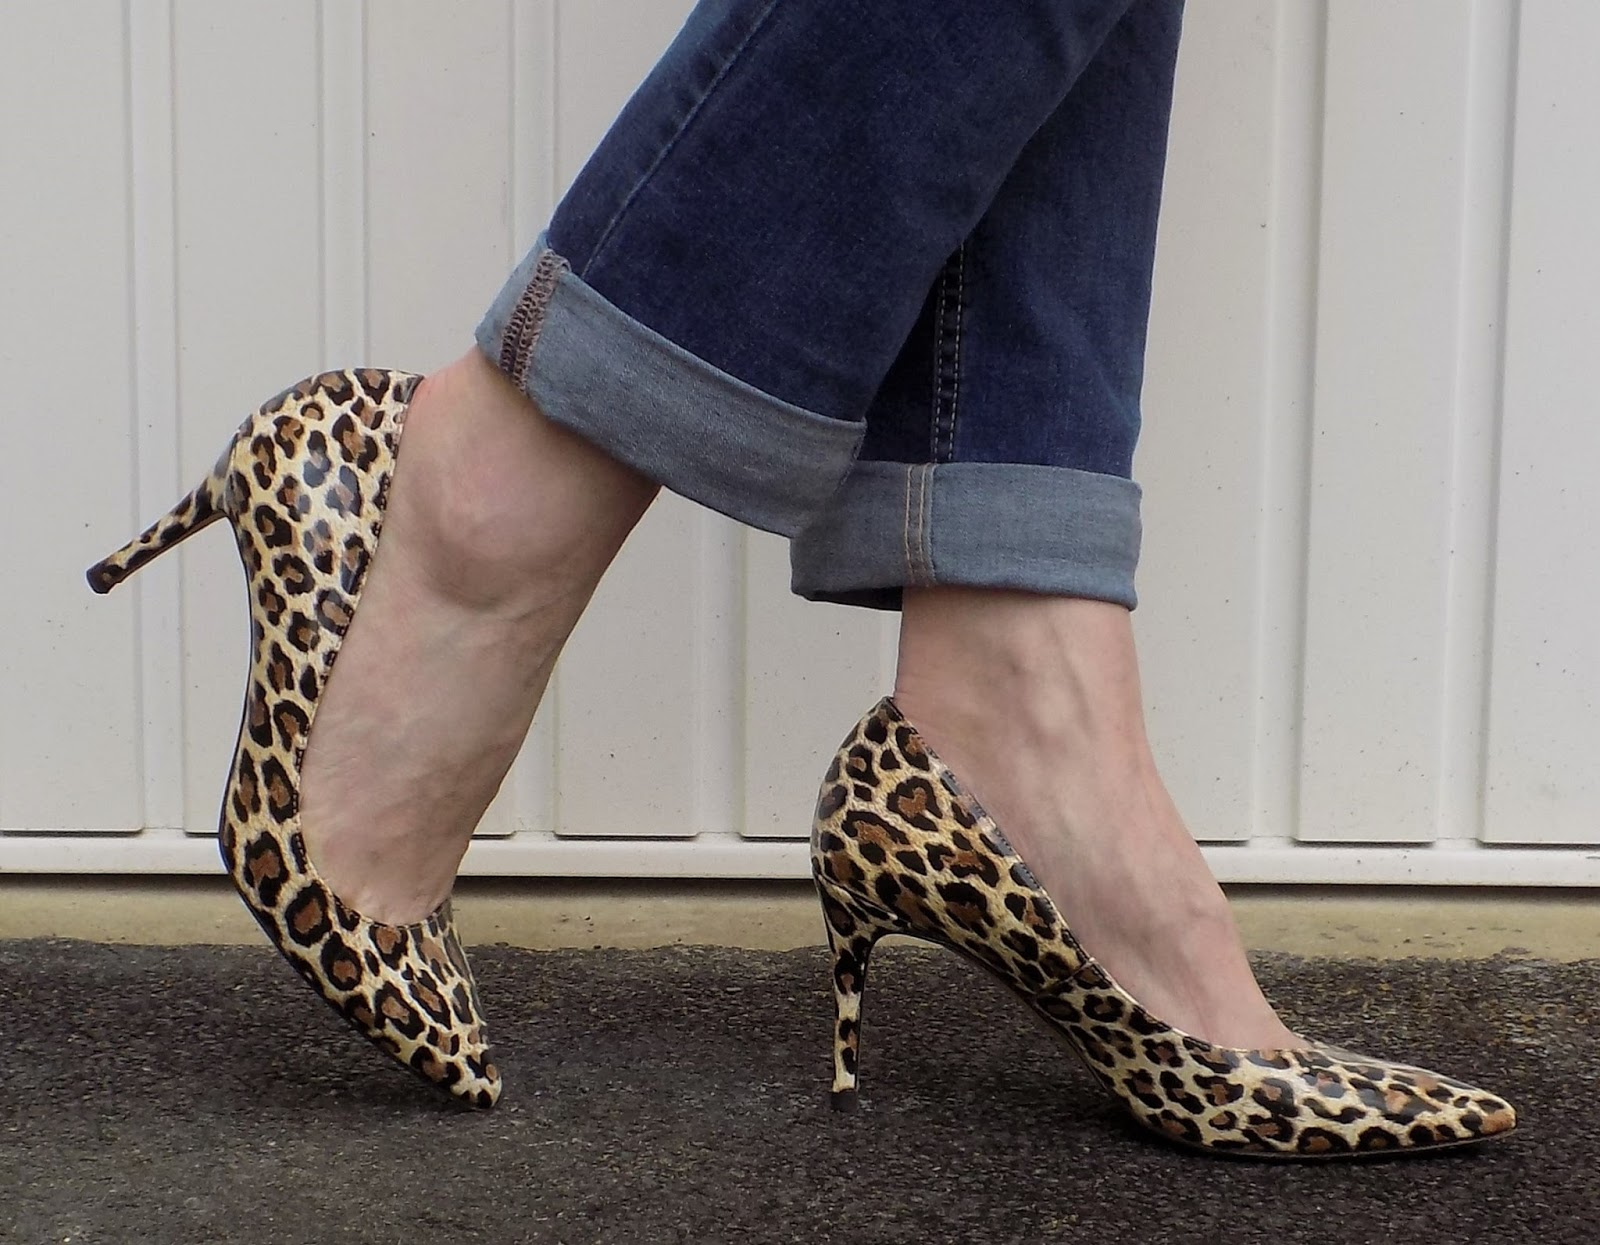 Boyfriend jeans and leopard print heels